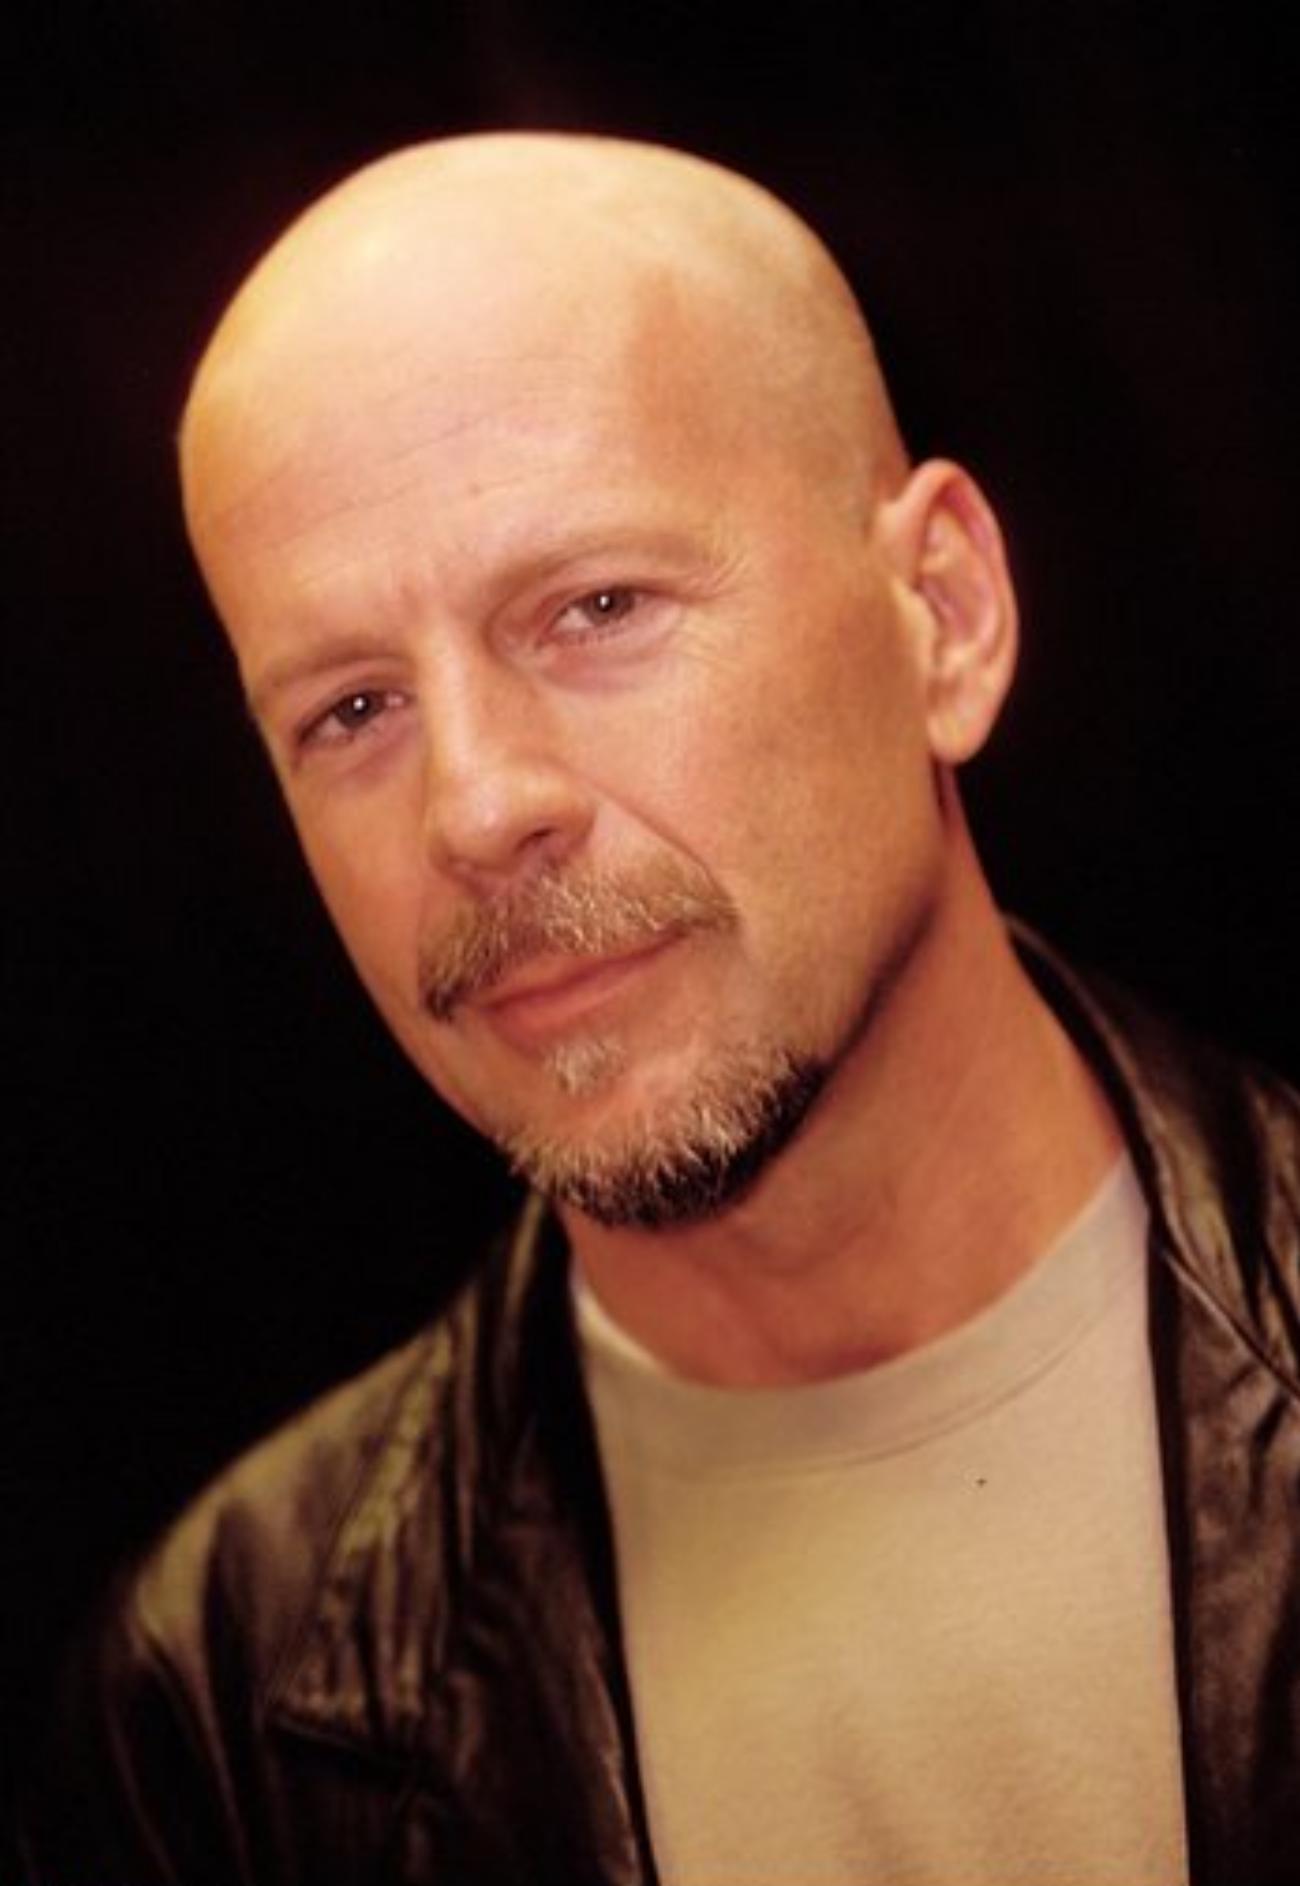 Bruce Willis photo 60 ... Bruce Willis